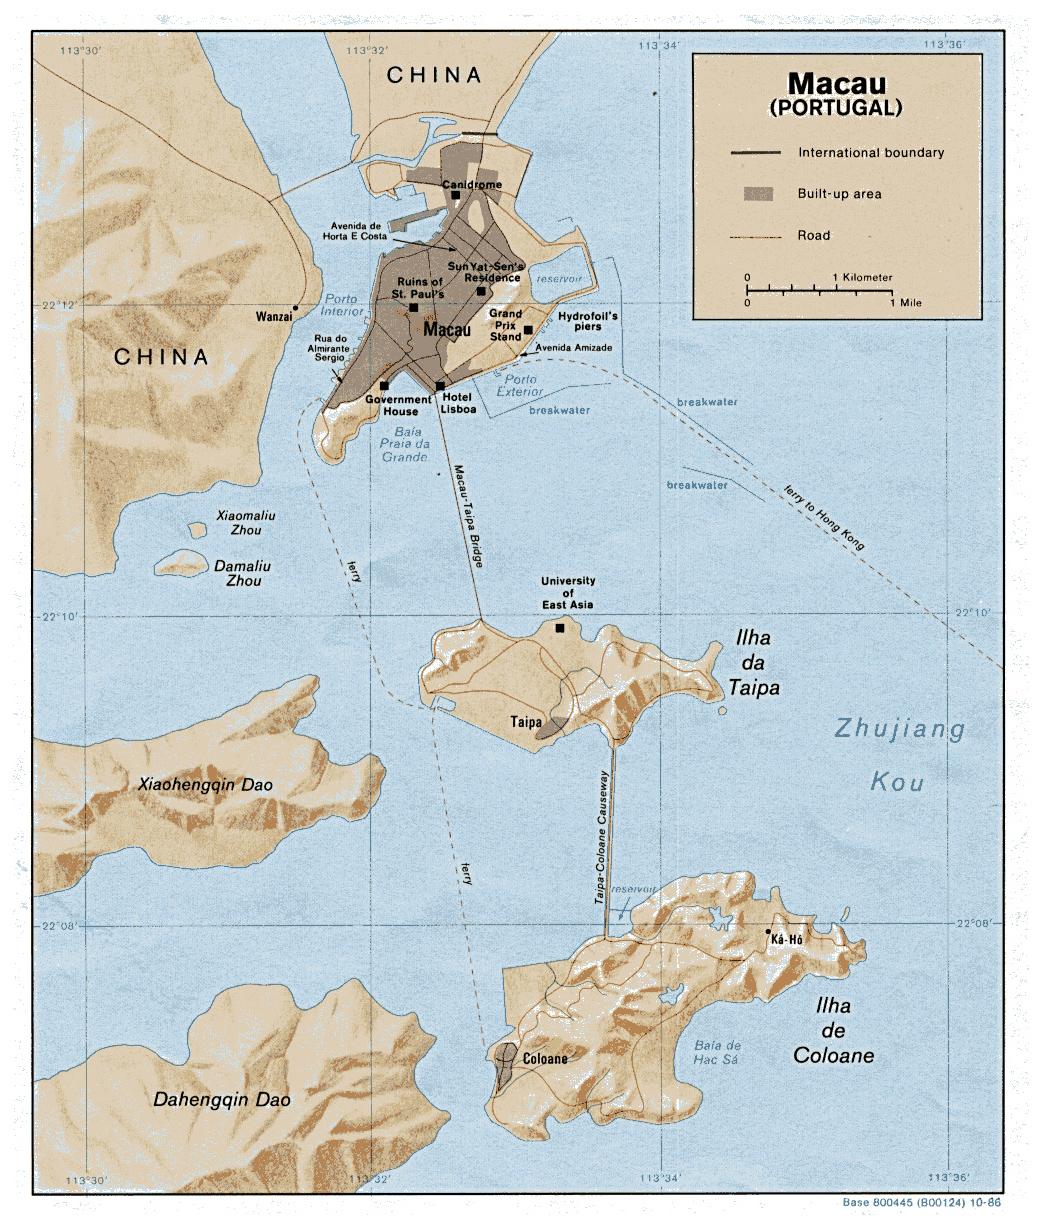 Macau On World Map.Maps Of Macau Detailed Macau Of Lebanon In English Tourist Map